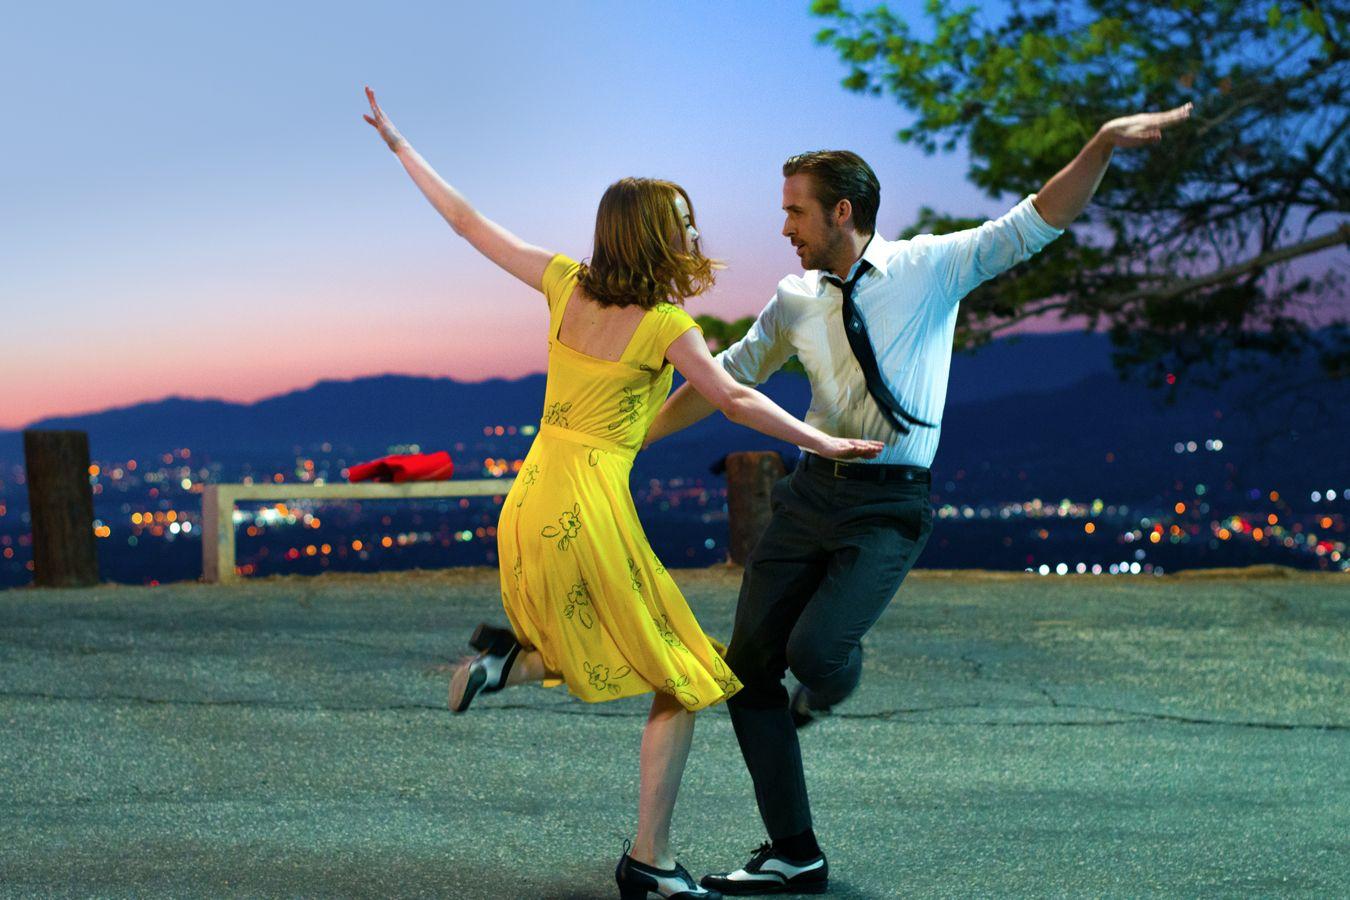 Still image from La La Land directed by Damien Chazelle